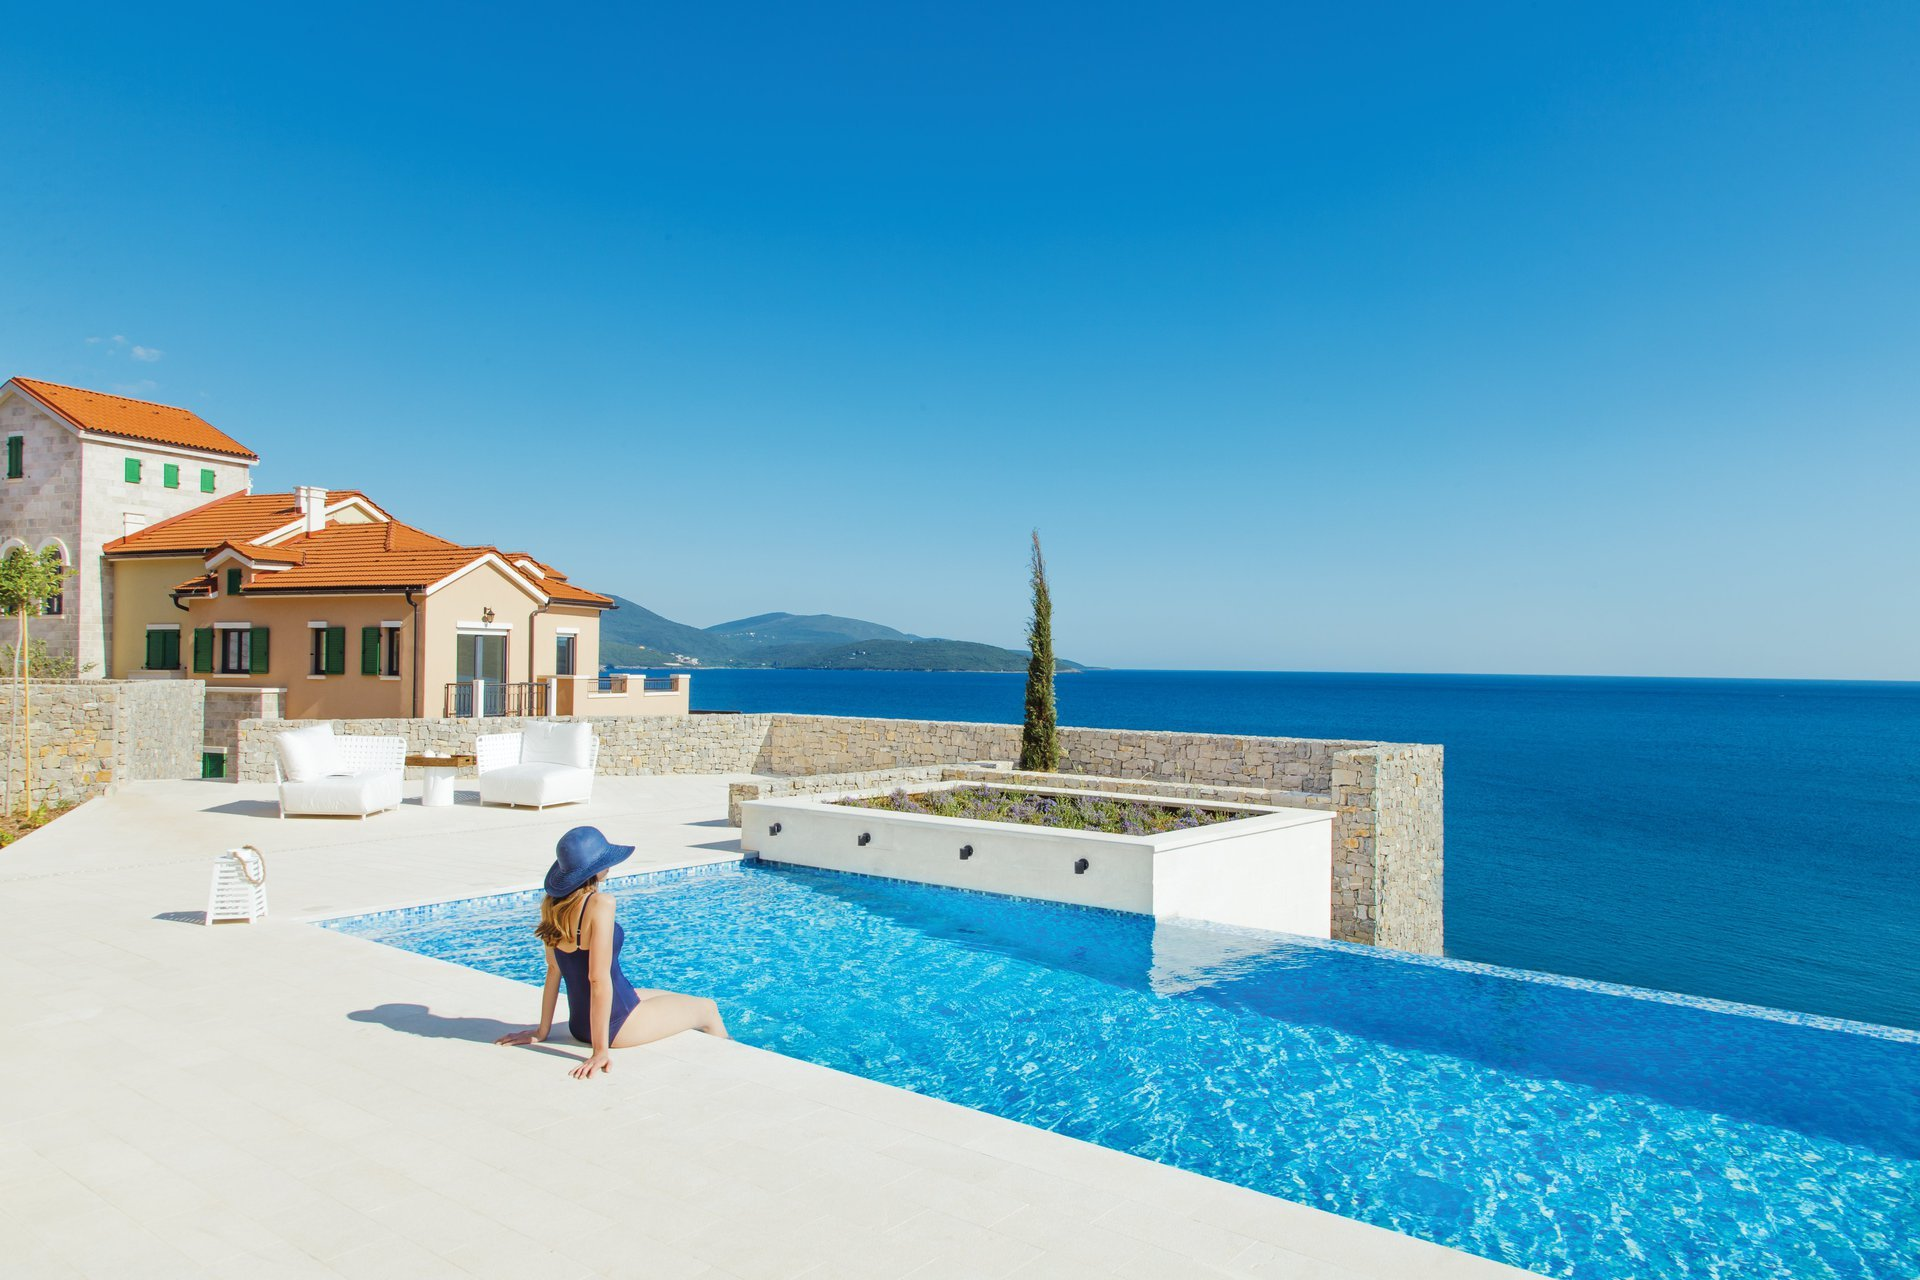 lustica-bay-montenegro-lifestyle-swimming-pool-5616×3744-0101-1920×1280